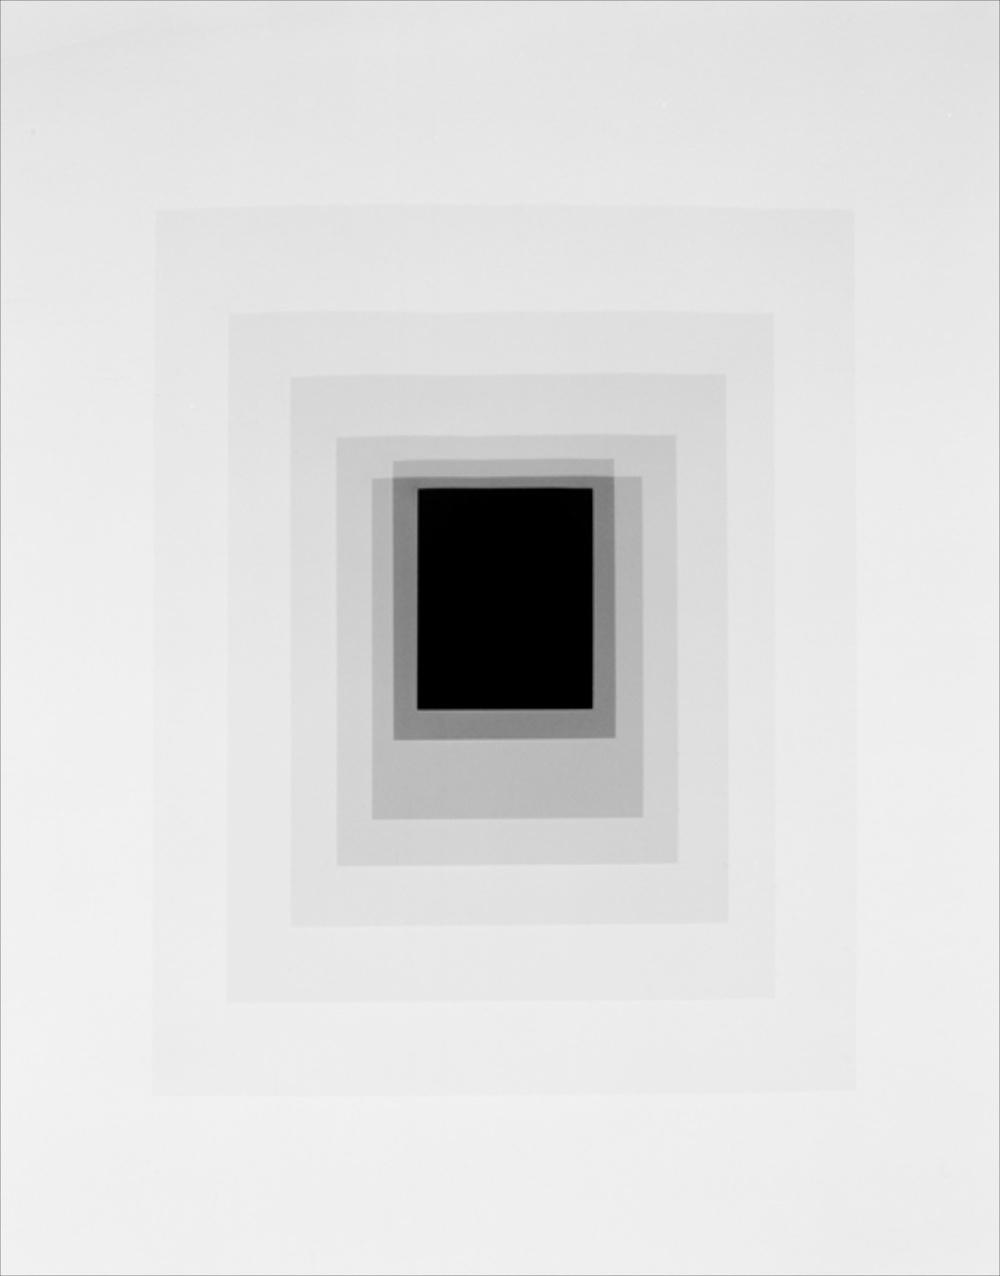 "John Opera  (untitled abstraction) 2007 C-print 22"" x 17"" JO005"